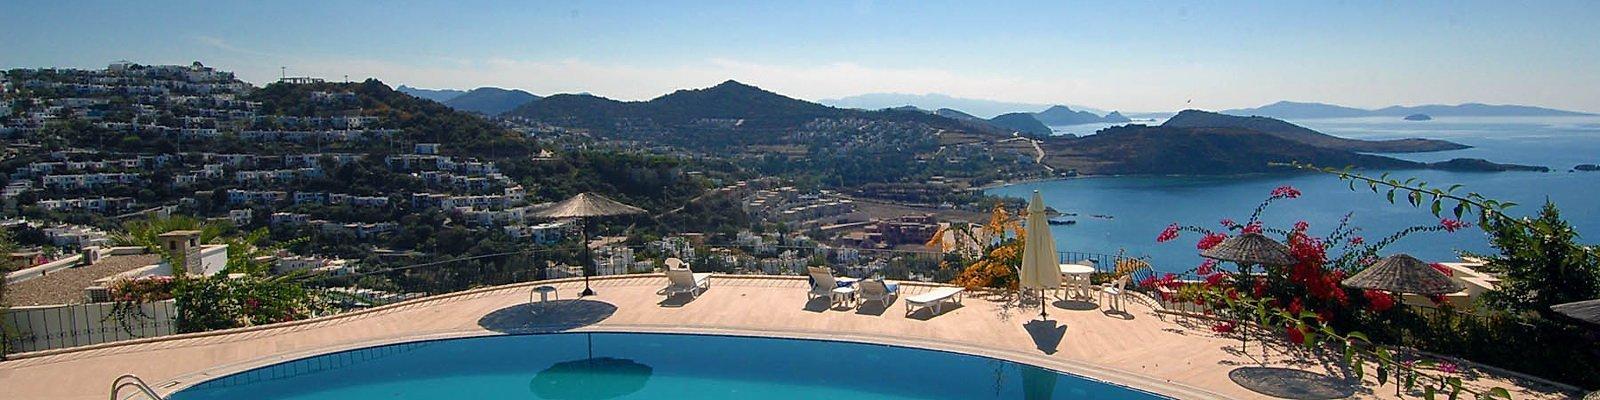 Homepage_Mark_Pool_Bodrum_property_Turkey_1600x400